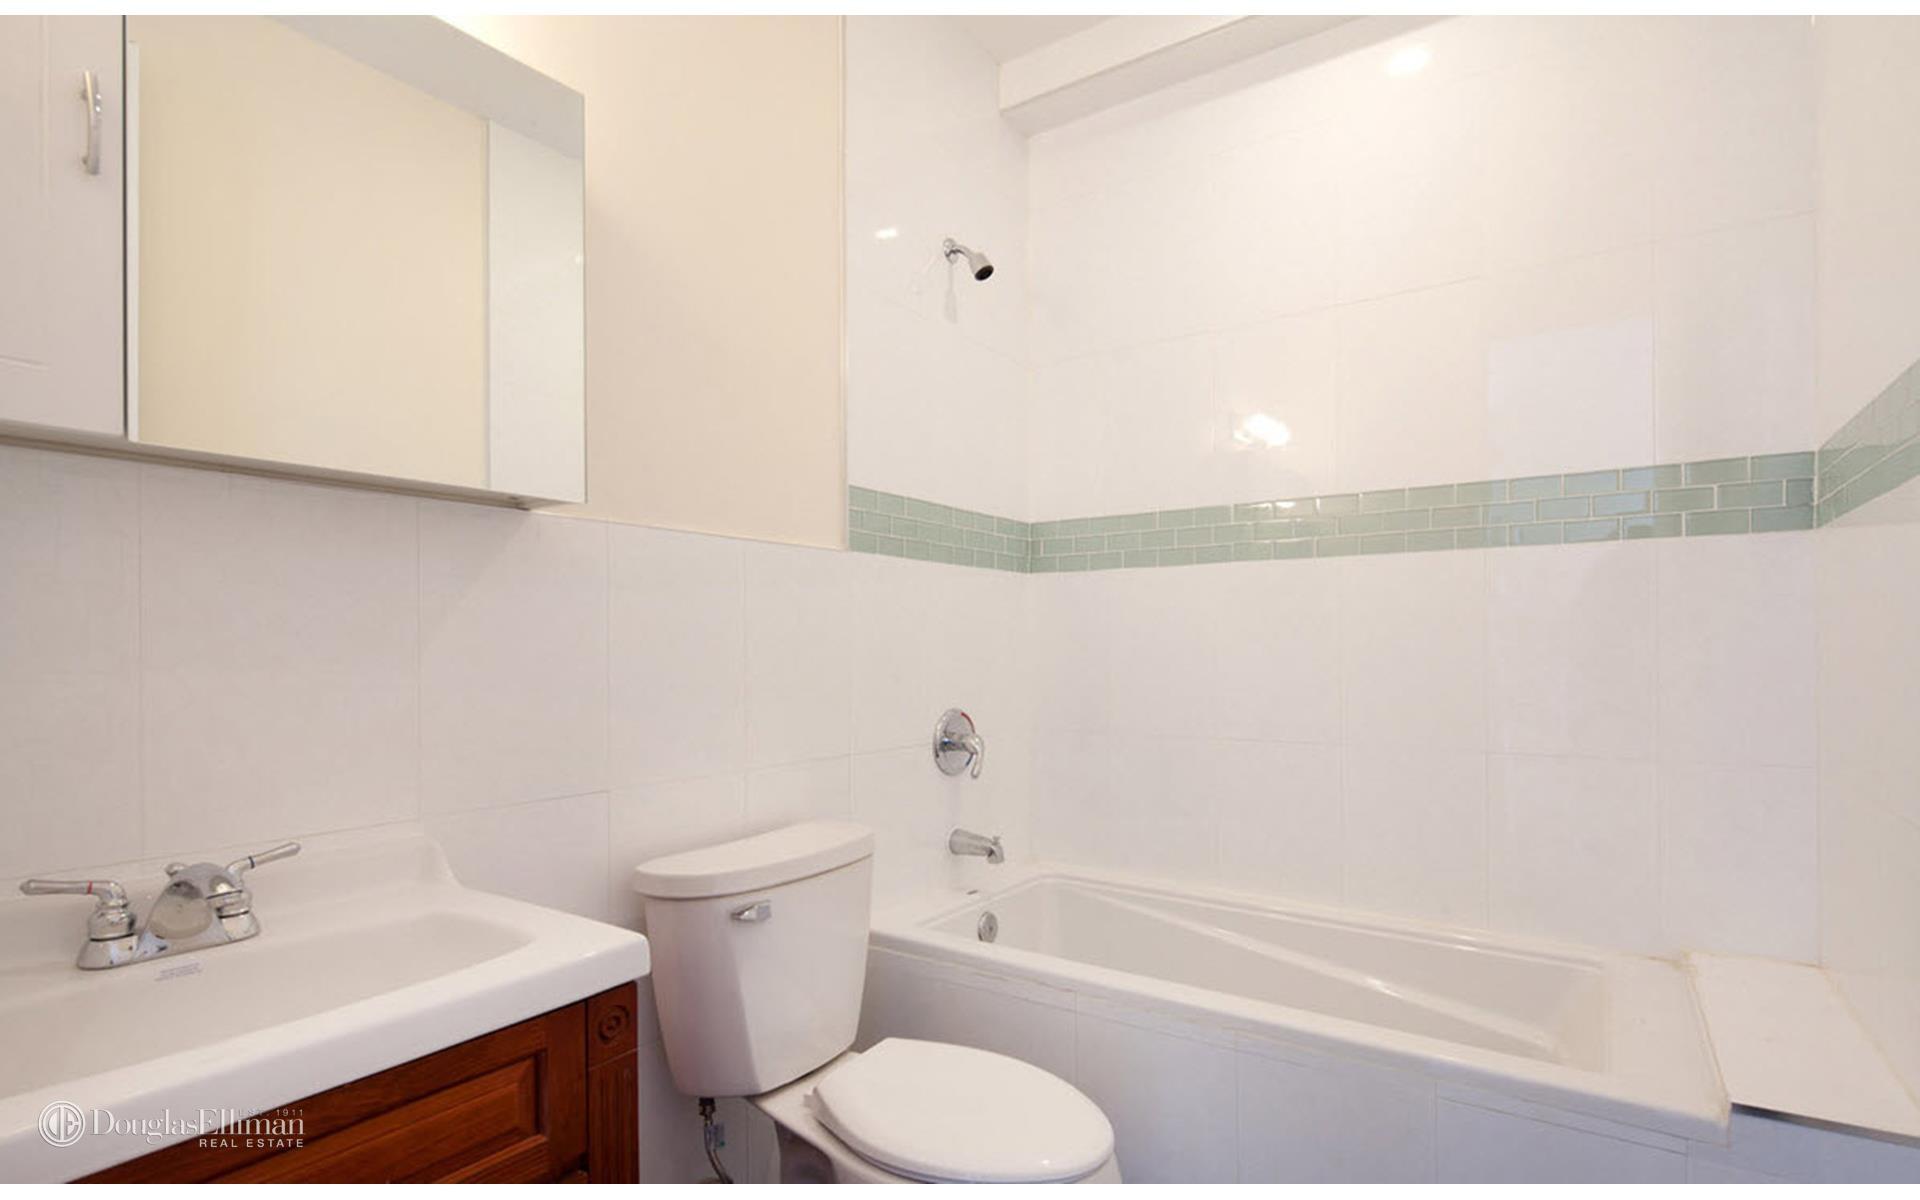 Williamsburg 2 bedroom rental at 172 skillman ave - 1 bedroom apartments williamsburg brooklyn ...